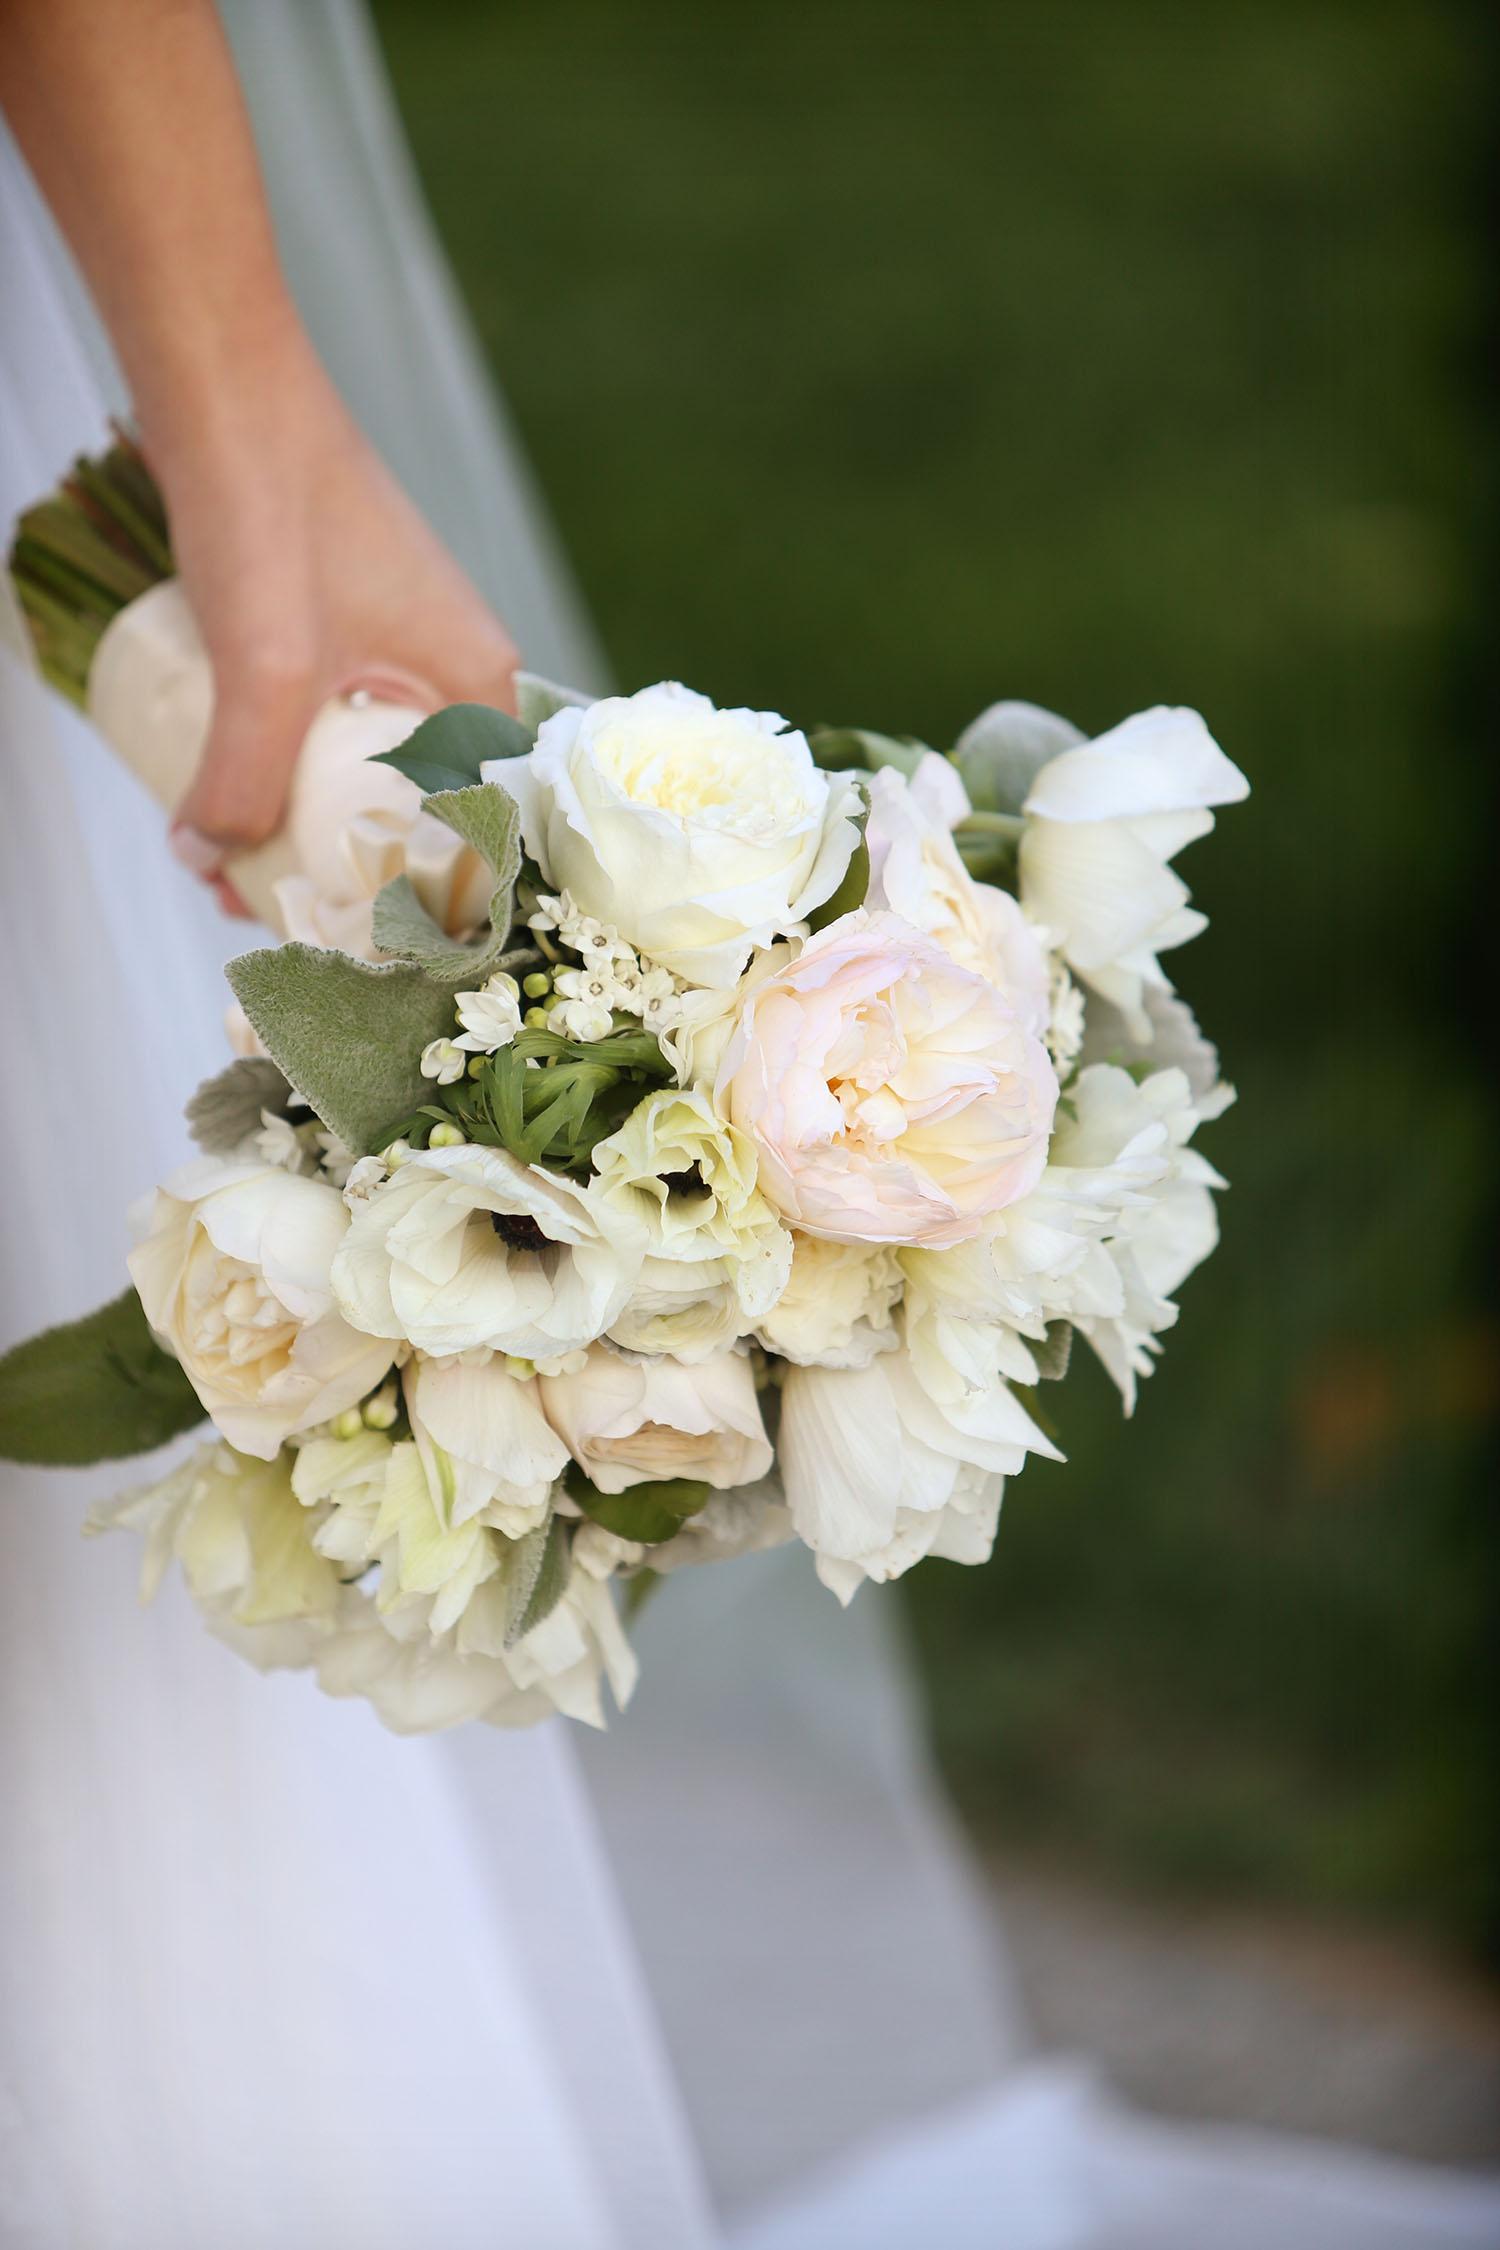 Alison Conklin Photography  | Wedding Reception | GulphMills Golf Club, Kingof Prussia, PA